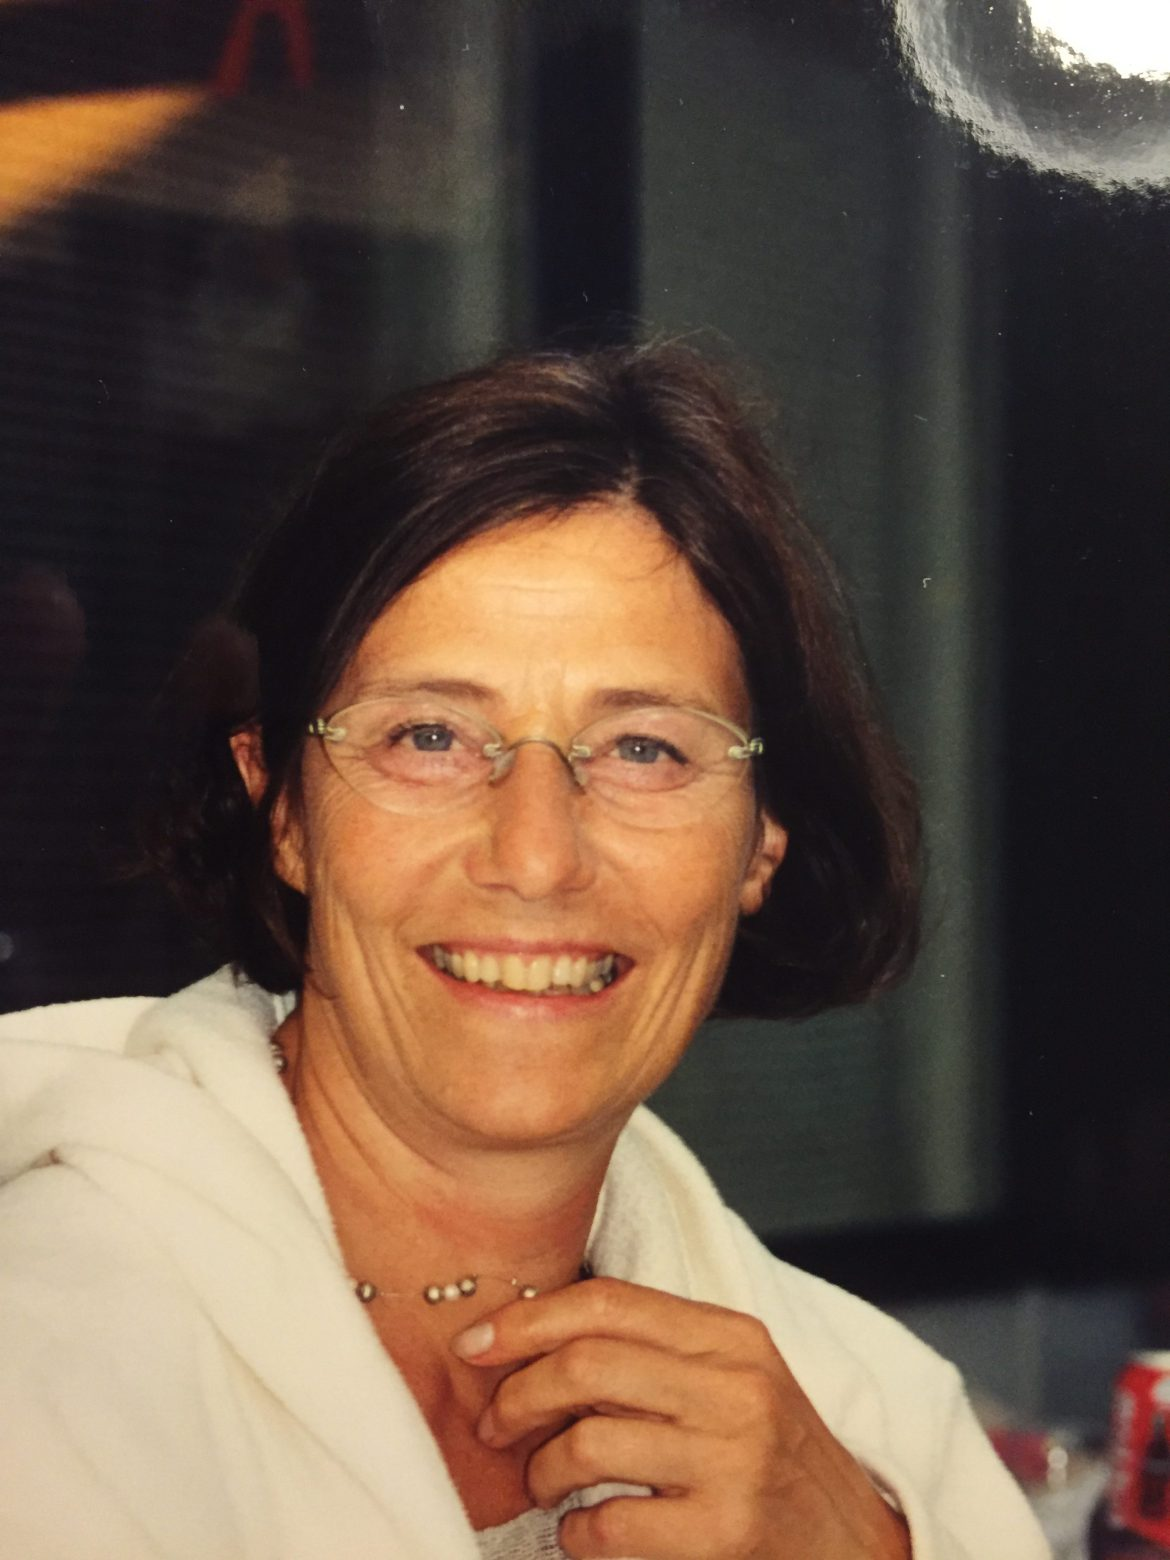 Vivian Persson